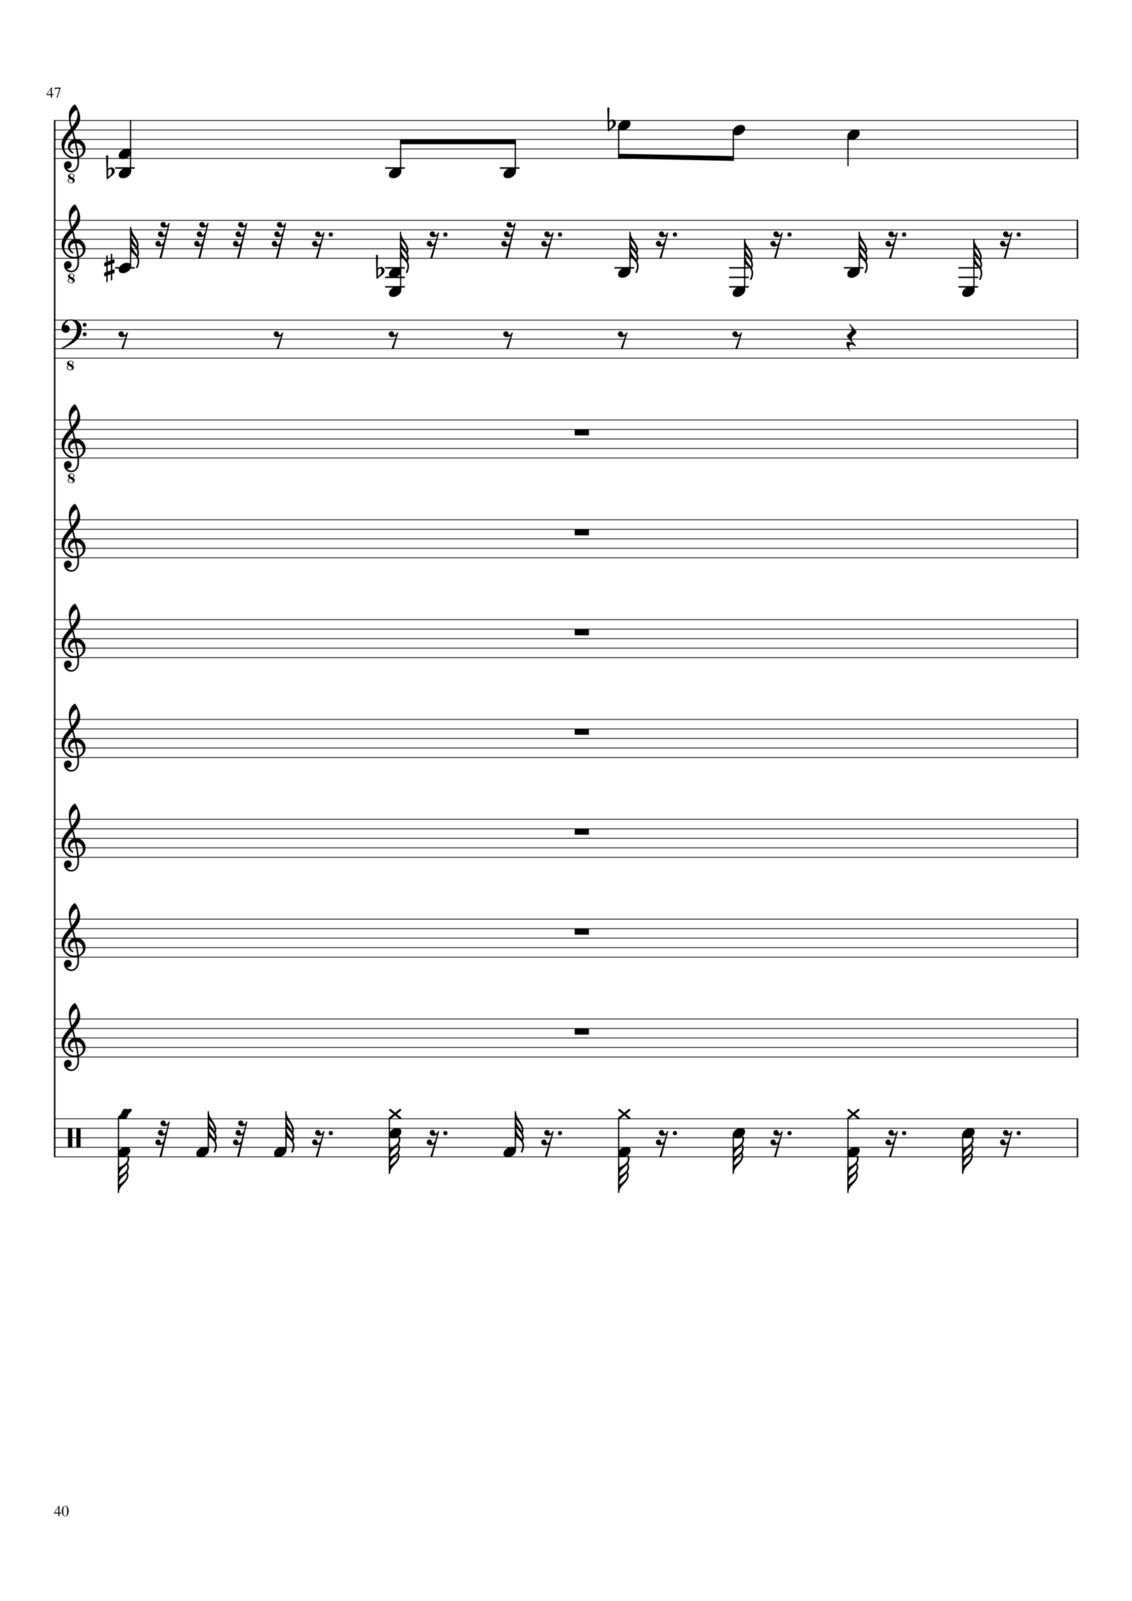 Belyiy sokol slide, Image 40